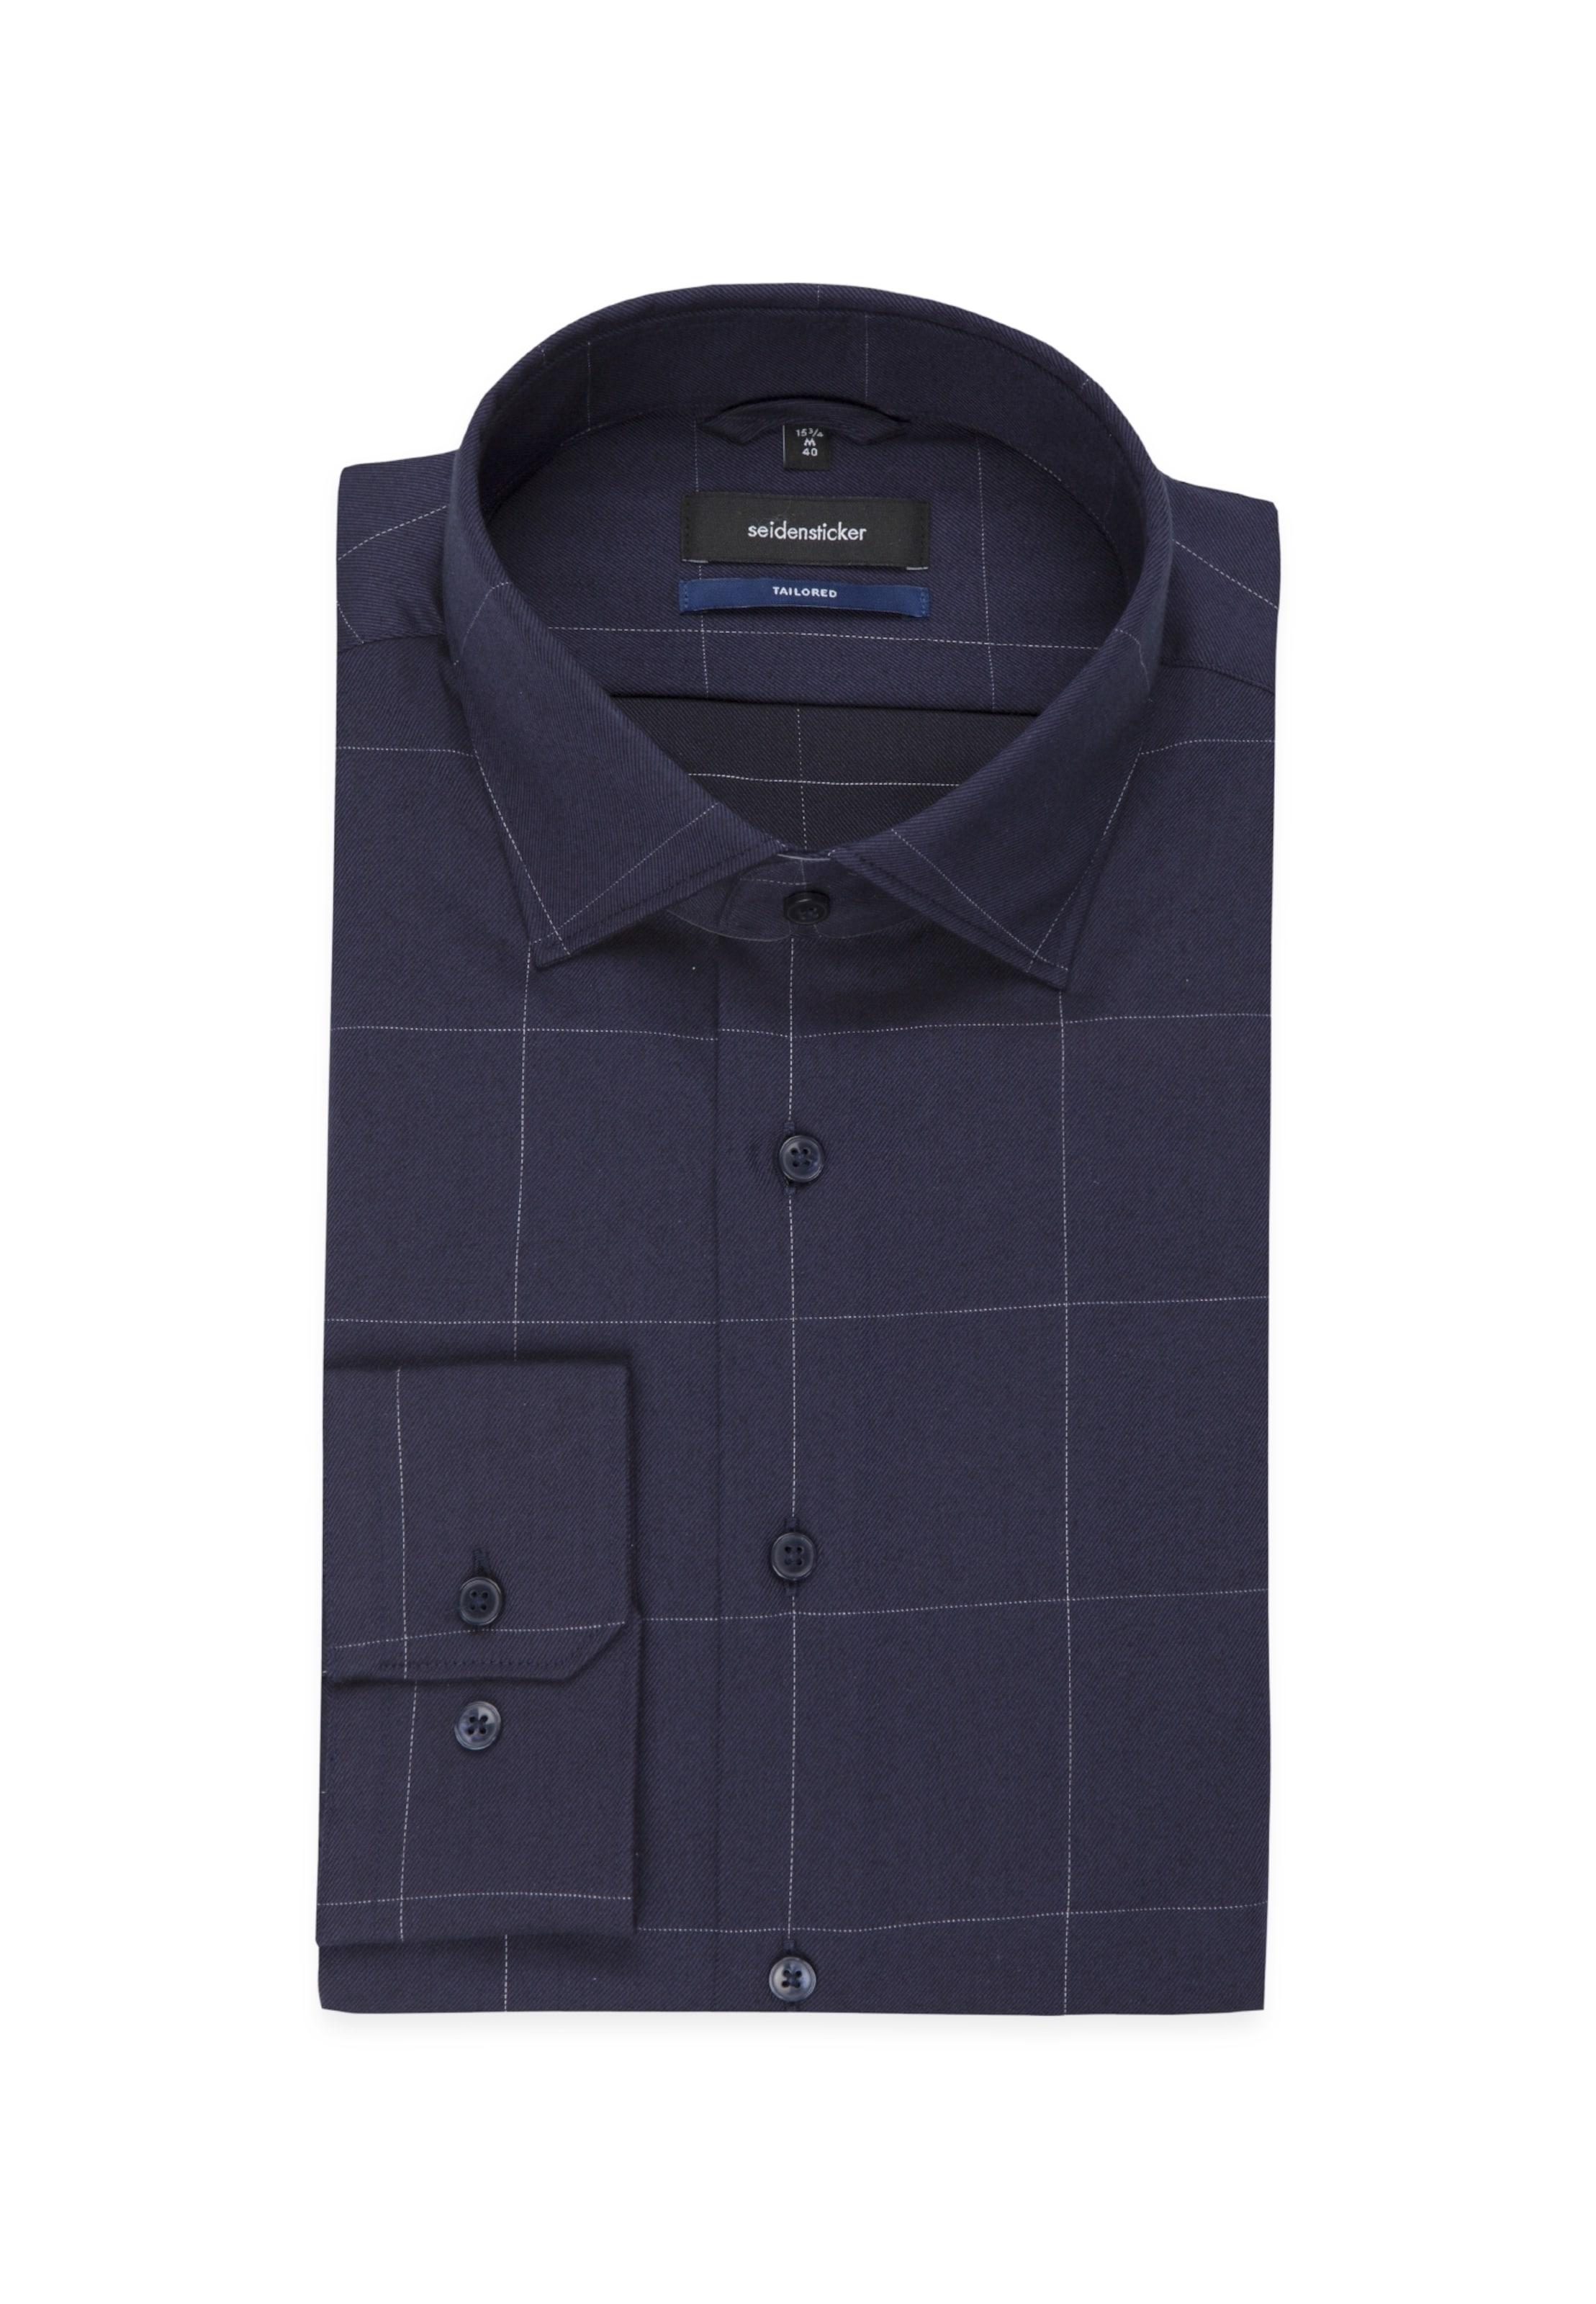 'tailored' In Seidensticker Hemd Blau Business rdCxoeB